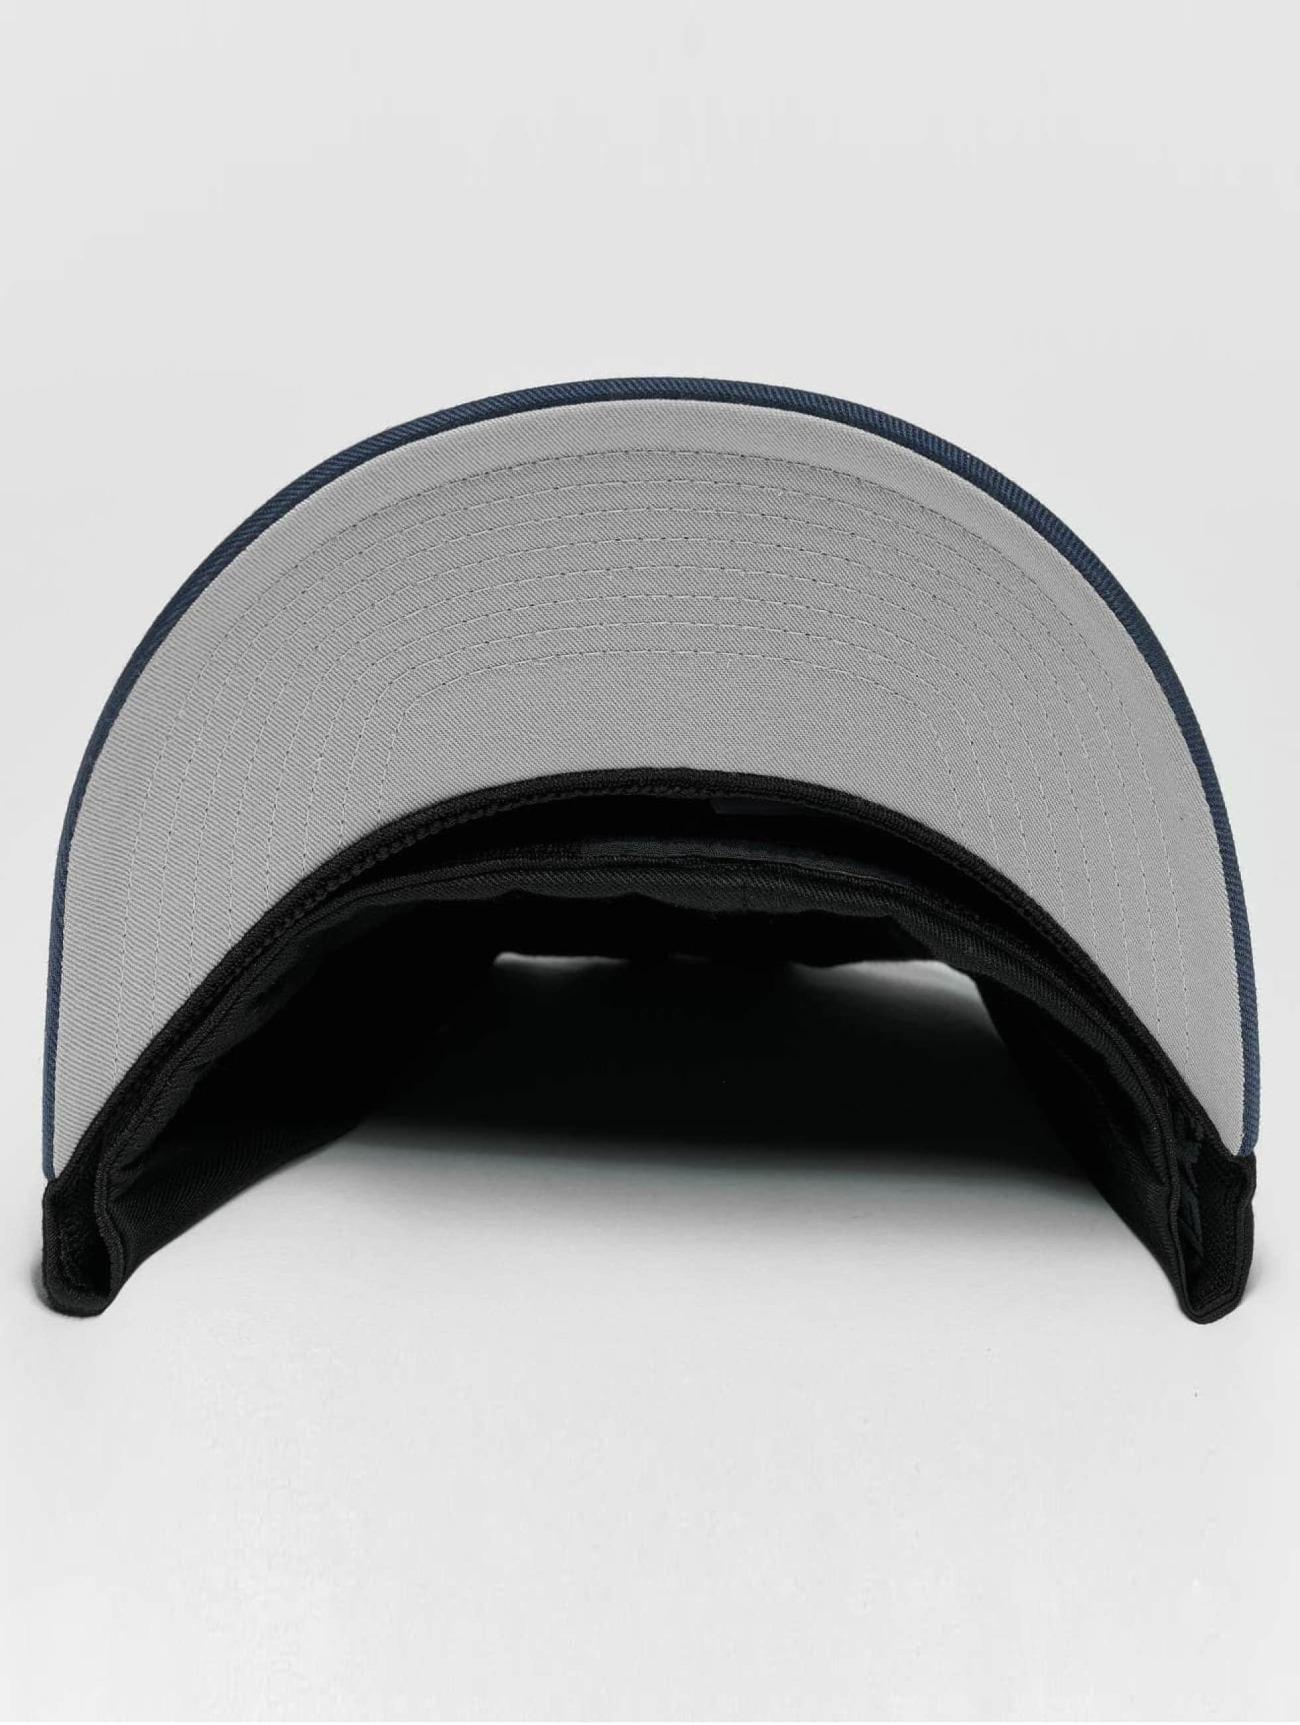 Flexfit  2-Tone Wooly Combed  noir  Casquette Flex Fitted  478128 Homme Casquettes